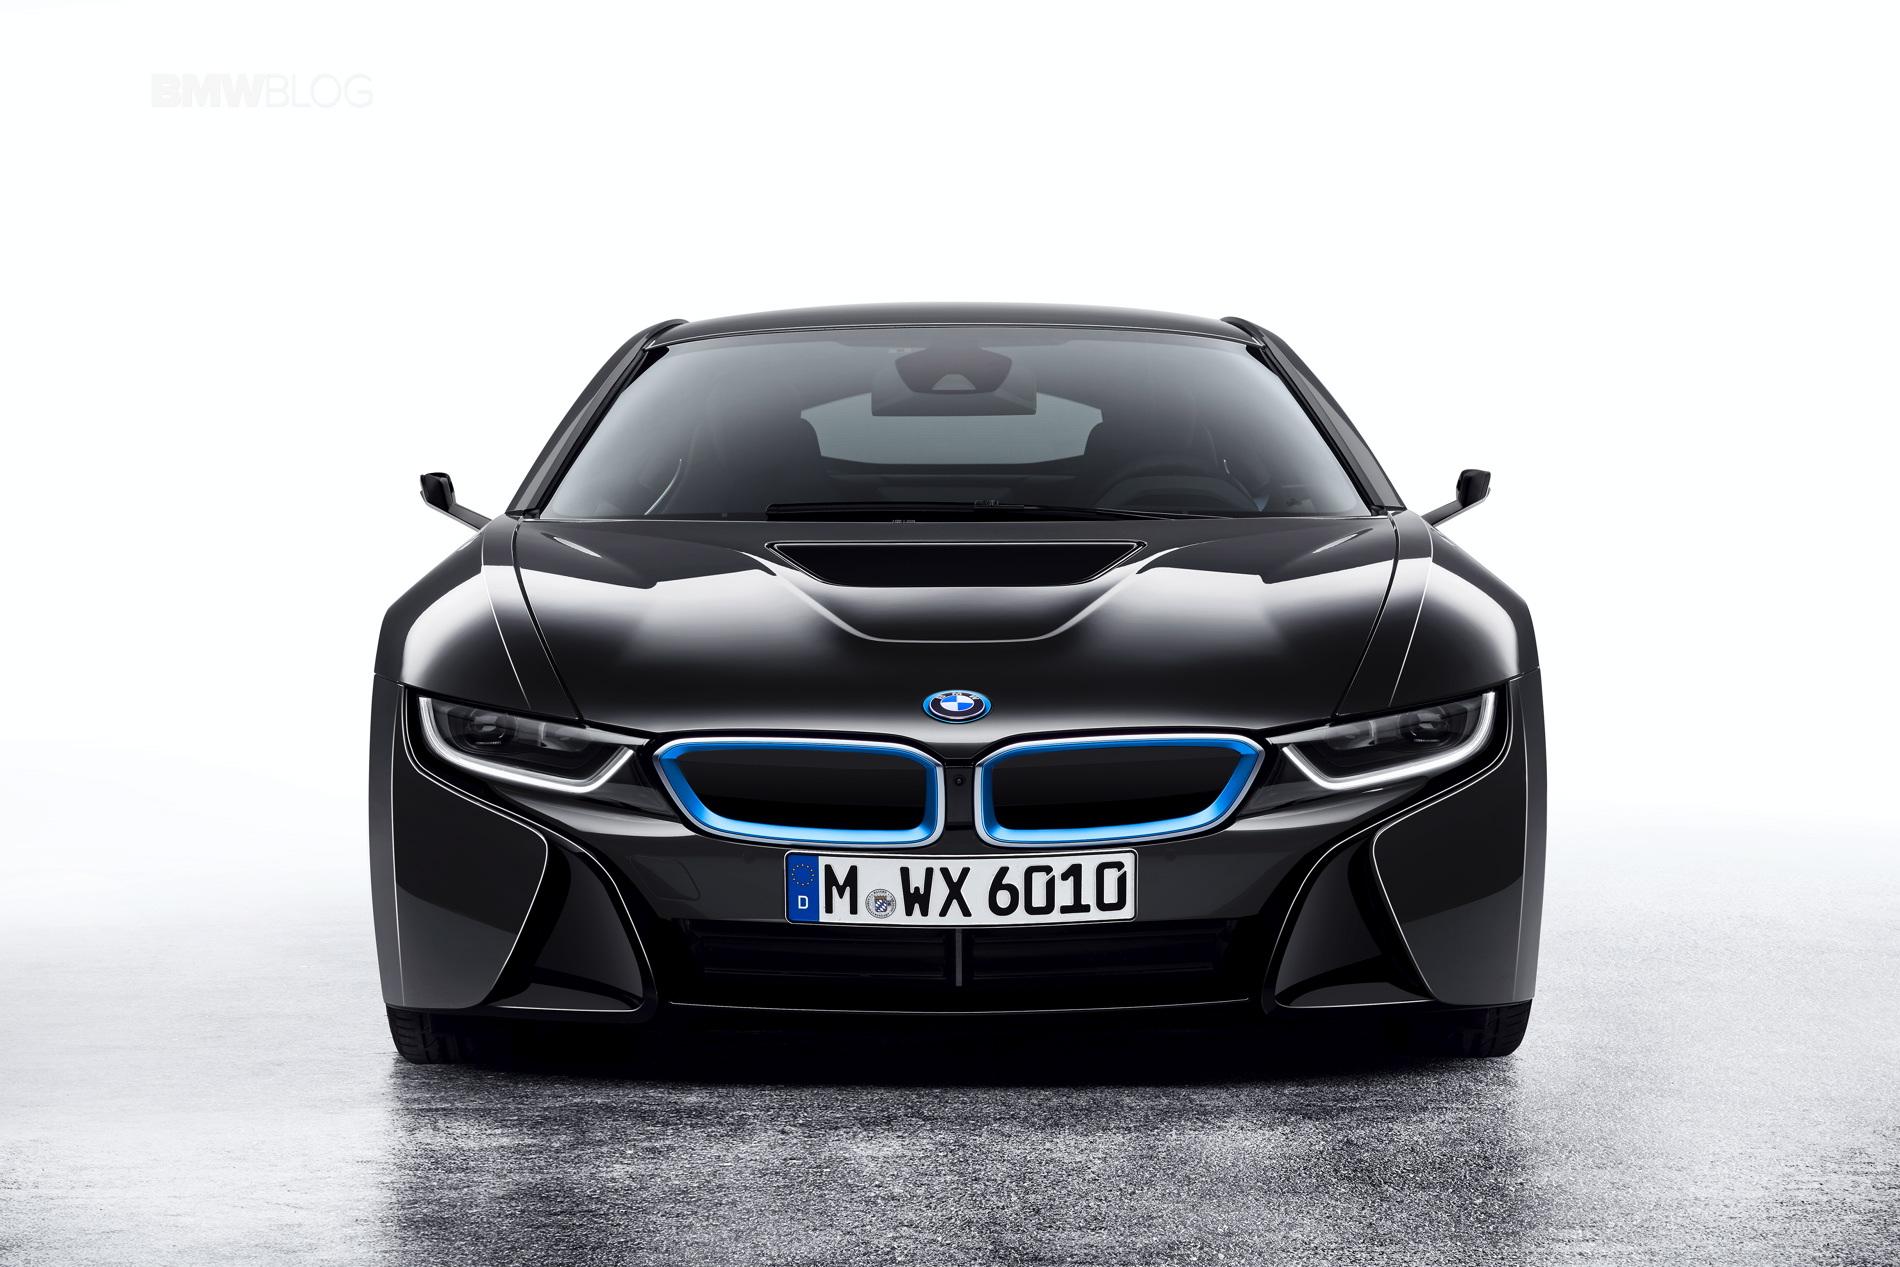 BMW-i8-mirrorless-images-1